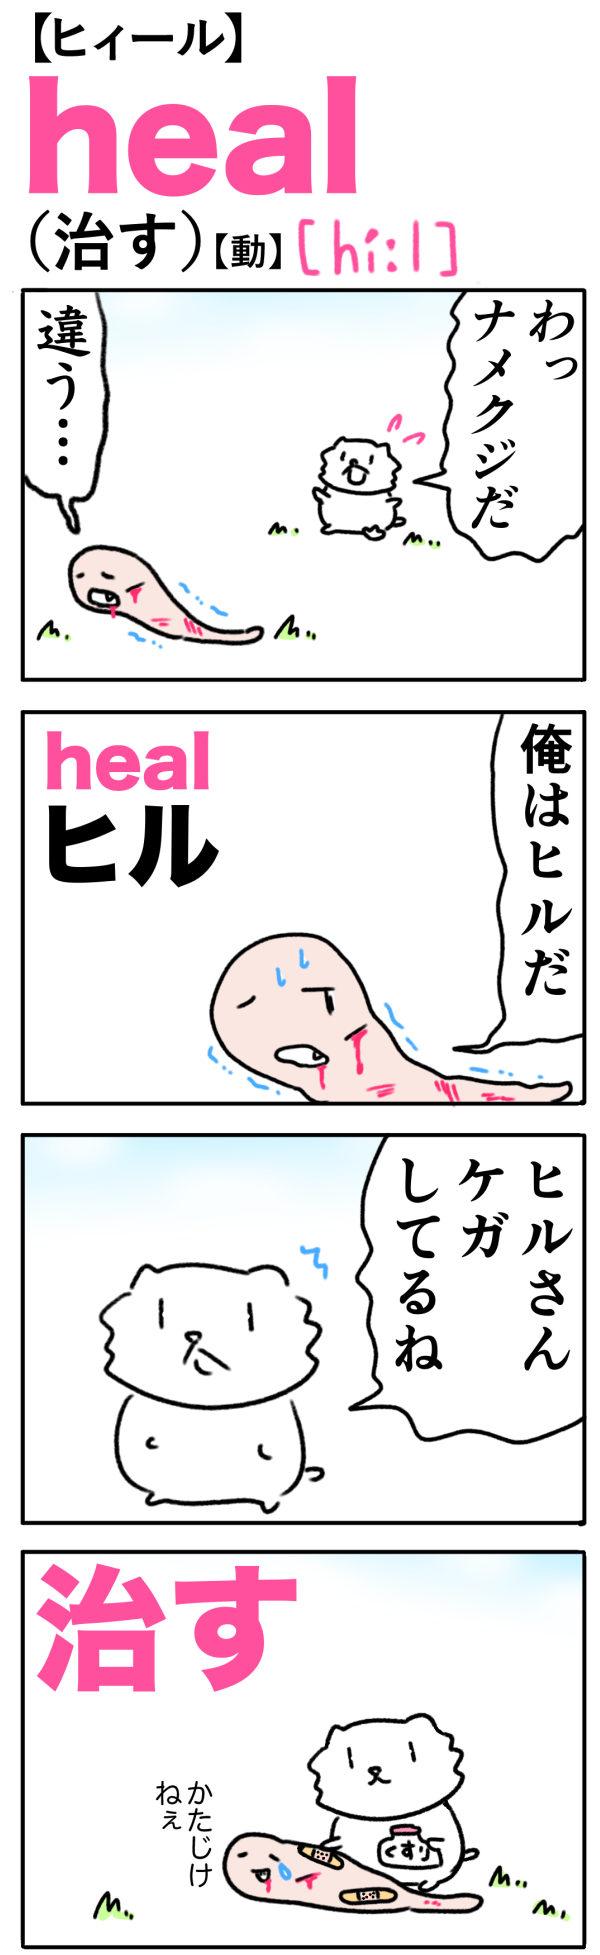 heal(治す) の語呂合わせ英単語